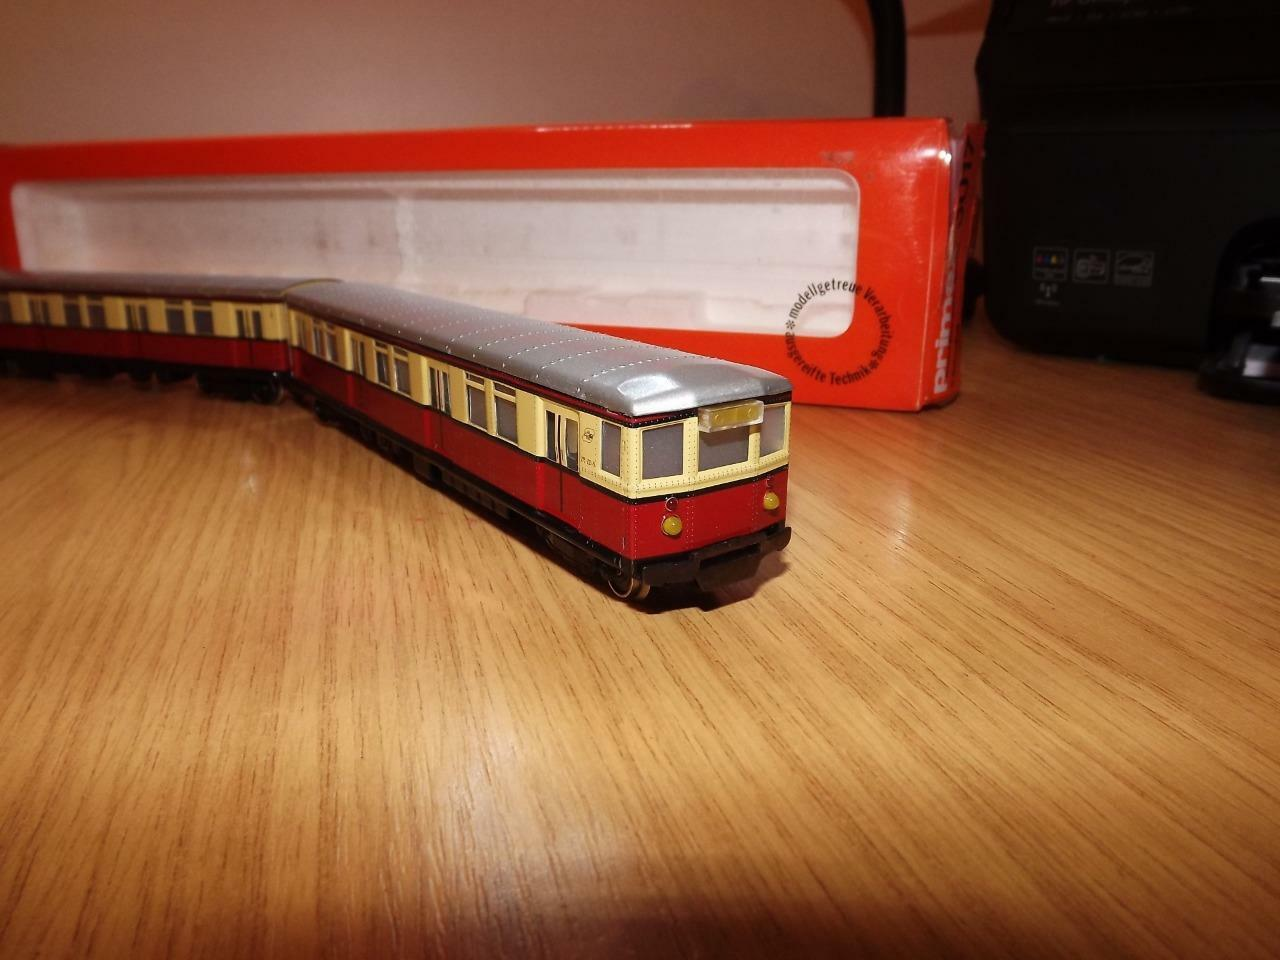 Ab37: Marklin / Primex HO Gauge 3017 S-Bahn Train BR 275 BVG - Exc/Boxed